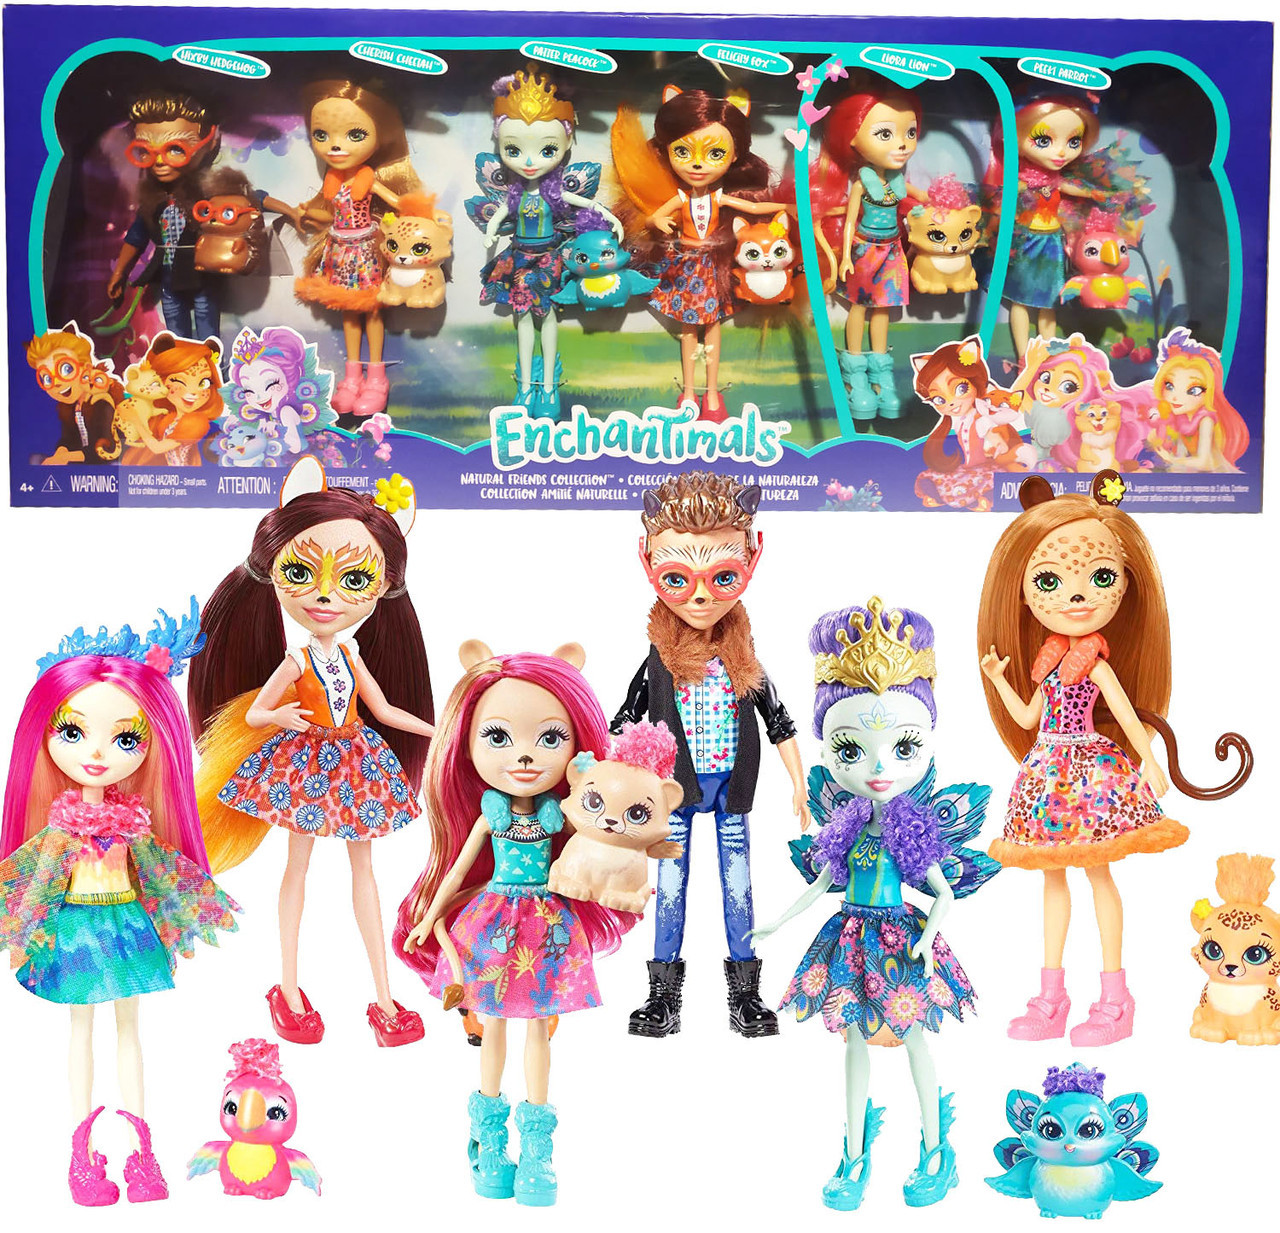 Энчантималс Супер набор из 6 кукол с питомцами / Enchantimals Natural Friends Collection 6 Dolls